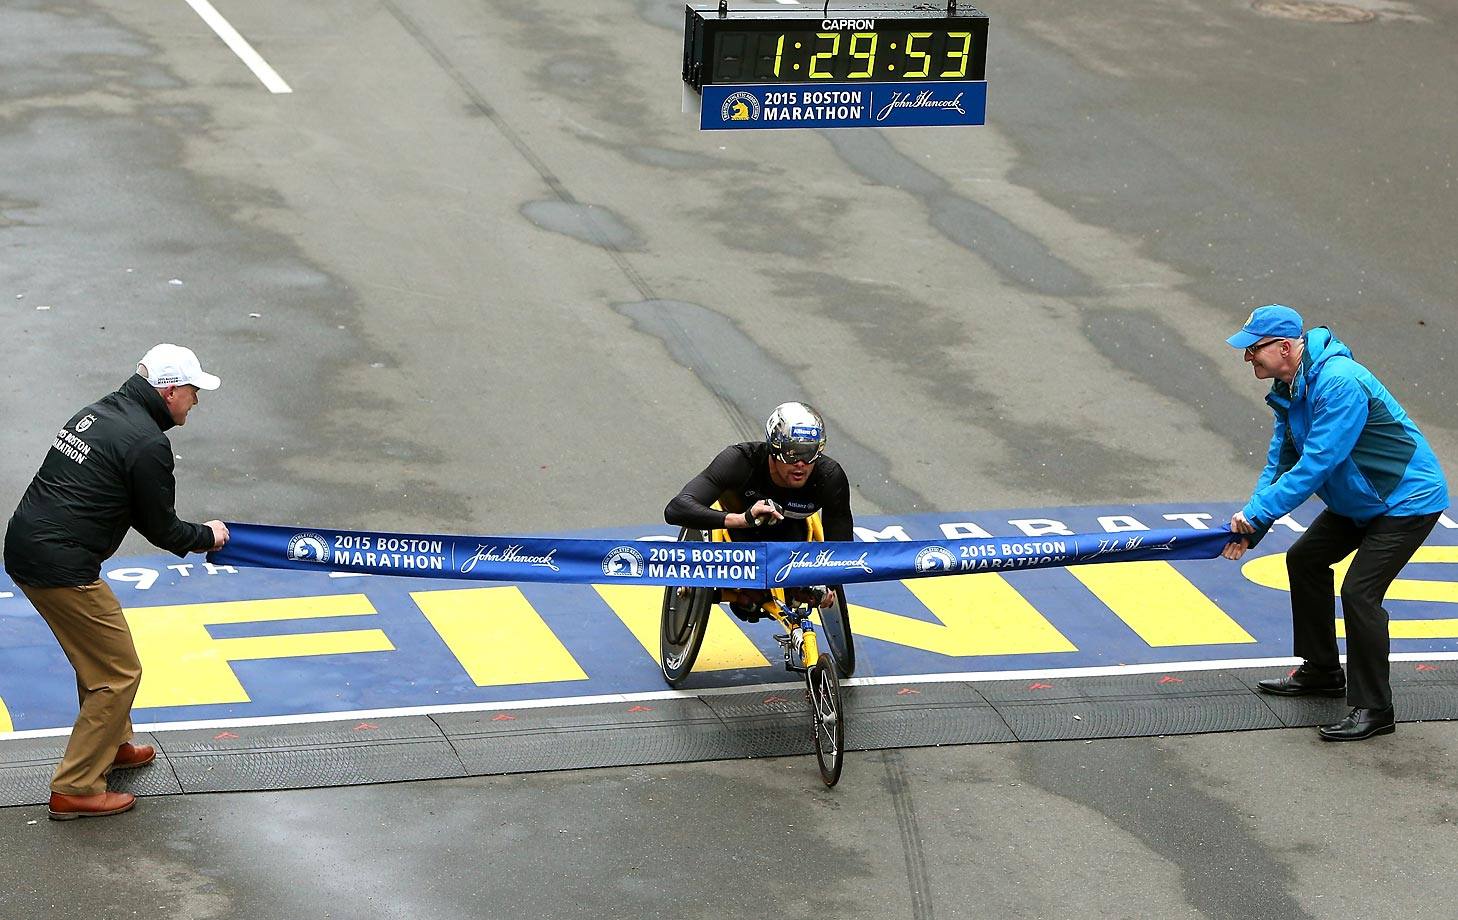 Marcel Hug of Switzerland crosses the finish line to win the men's push rim wheelchair division.